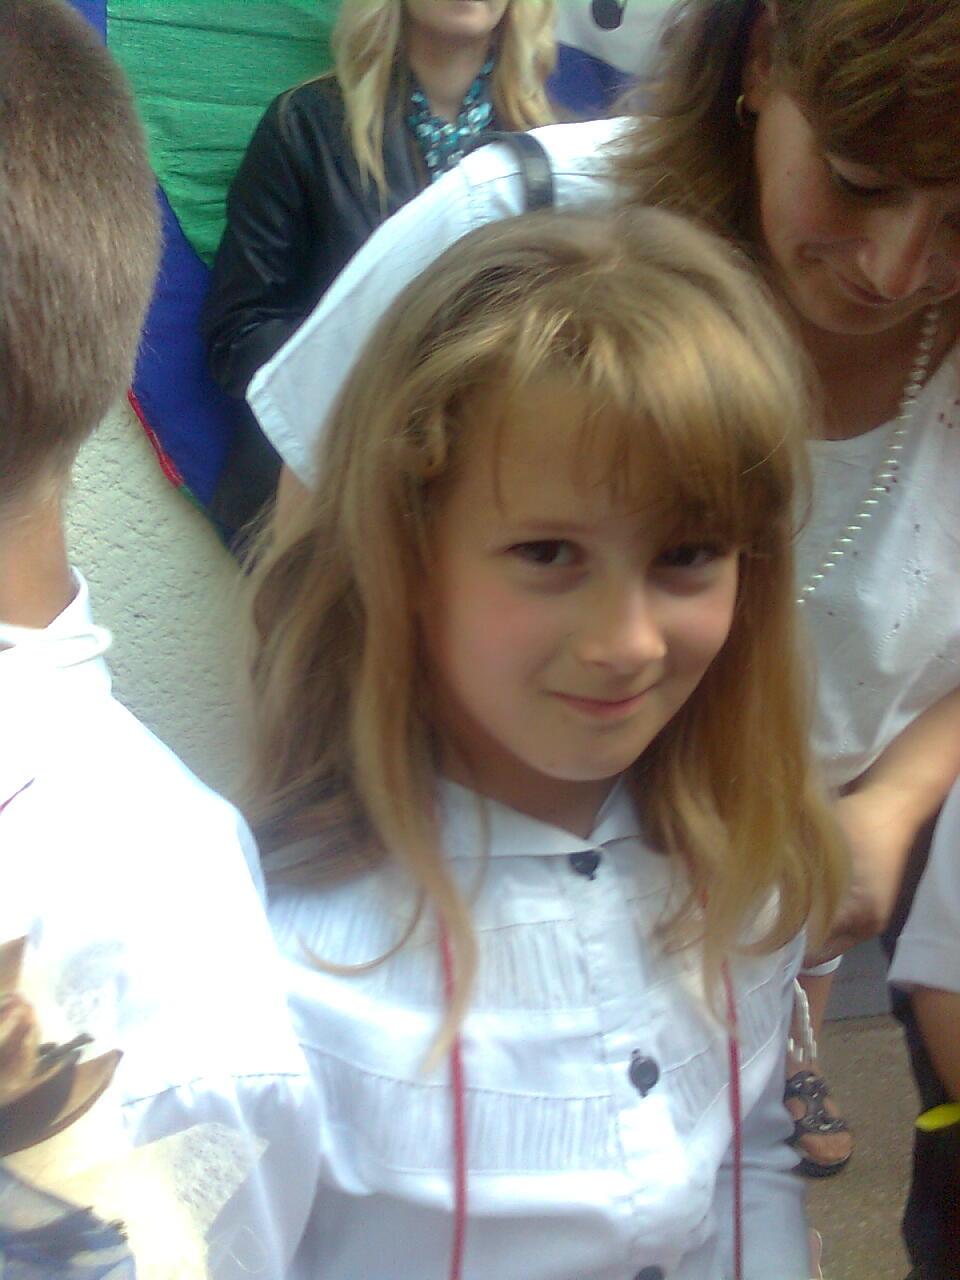 My little sister by RamboRocky